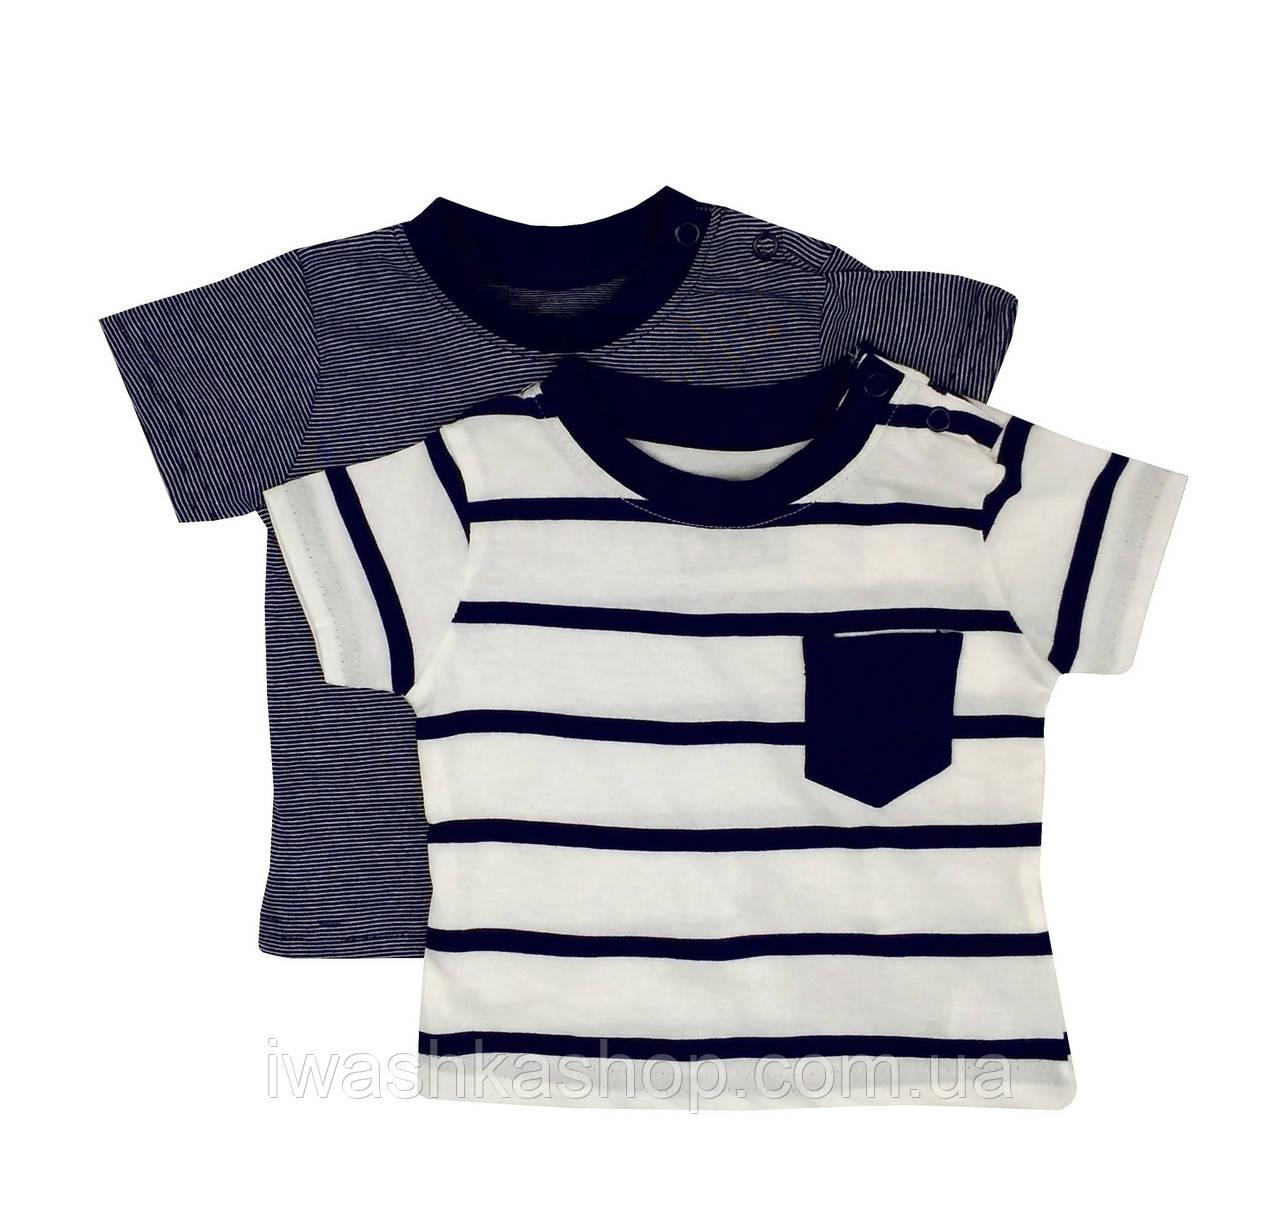 Комплект стильный полосатых футболок на мальчика 3 - 6 месяцев, р. 68, Early Days by Primark